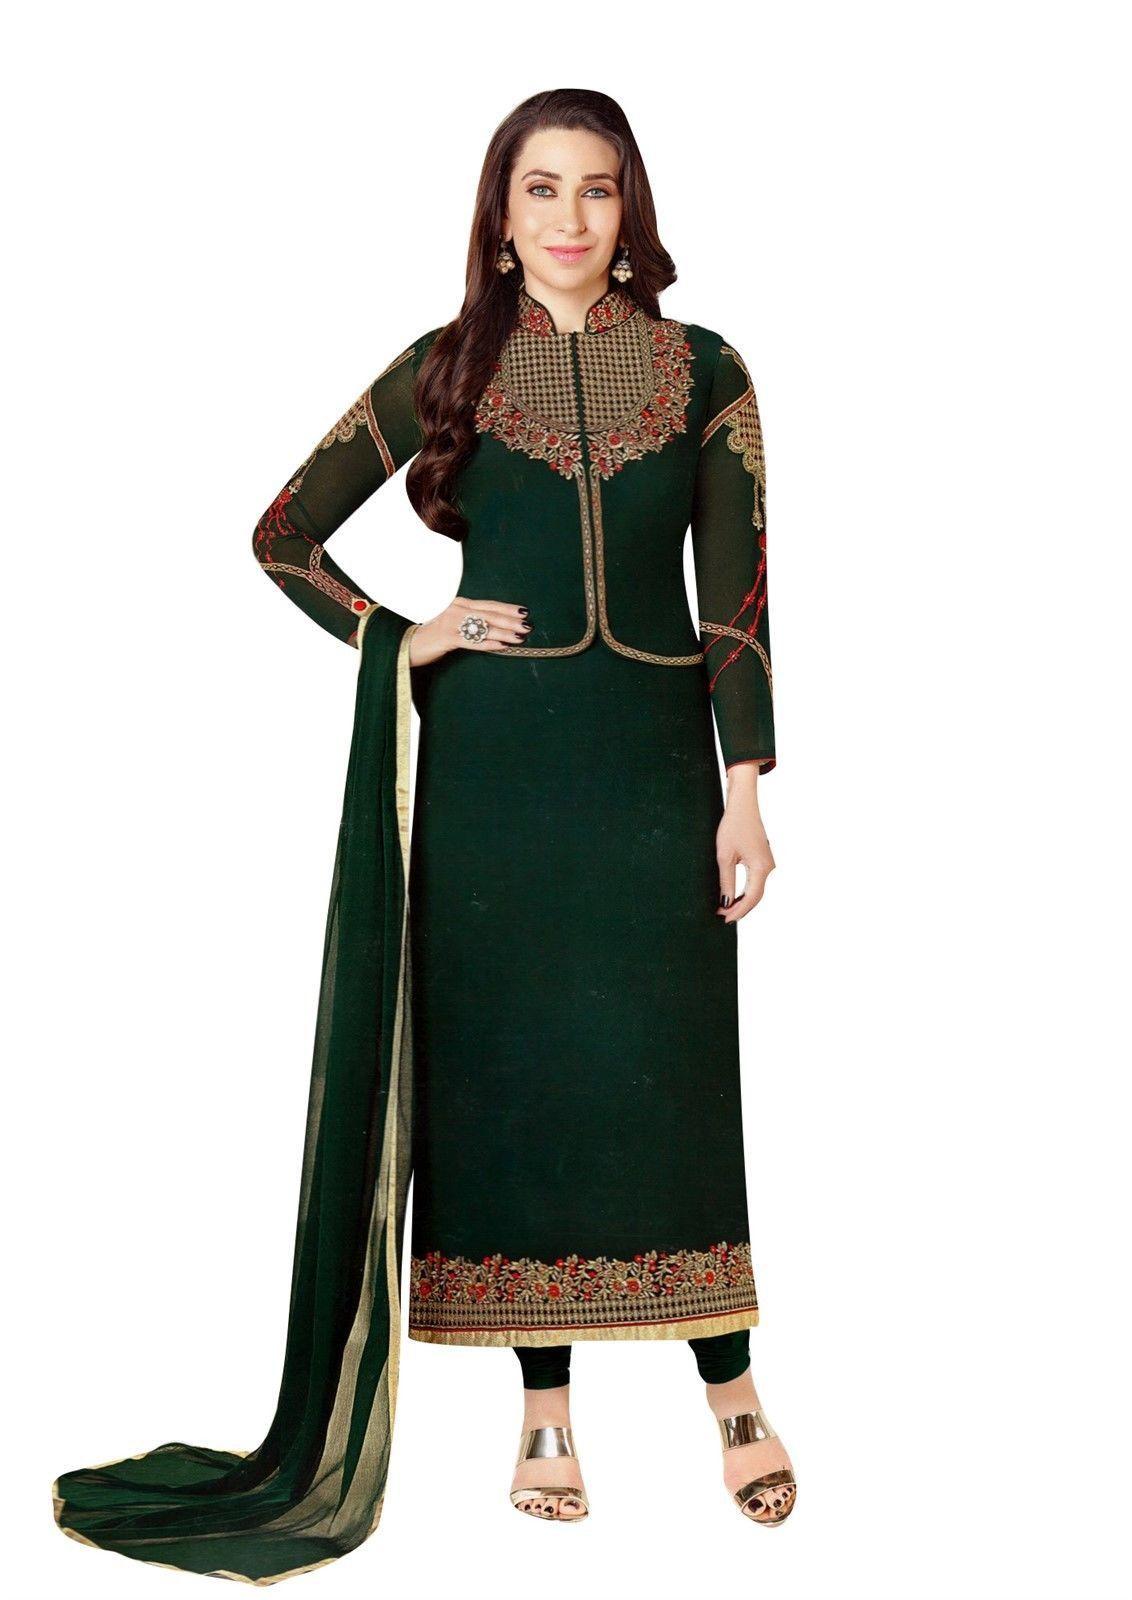 711ce979f1 Readymade Designer Salwar Kameez Wedding Partywear Chiffon Embroidered with  Jacket Koti Indian Dress #Designer #SalwarSuit #FreeShipping #SalwarKameez  ...